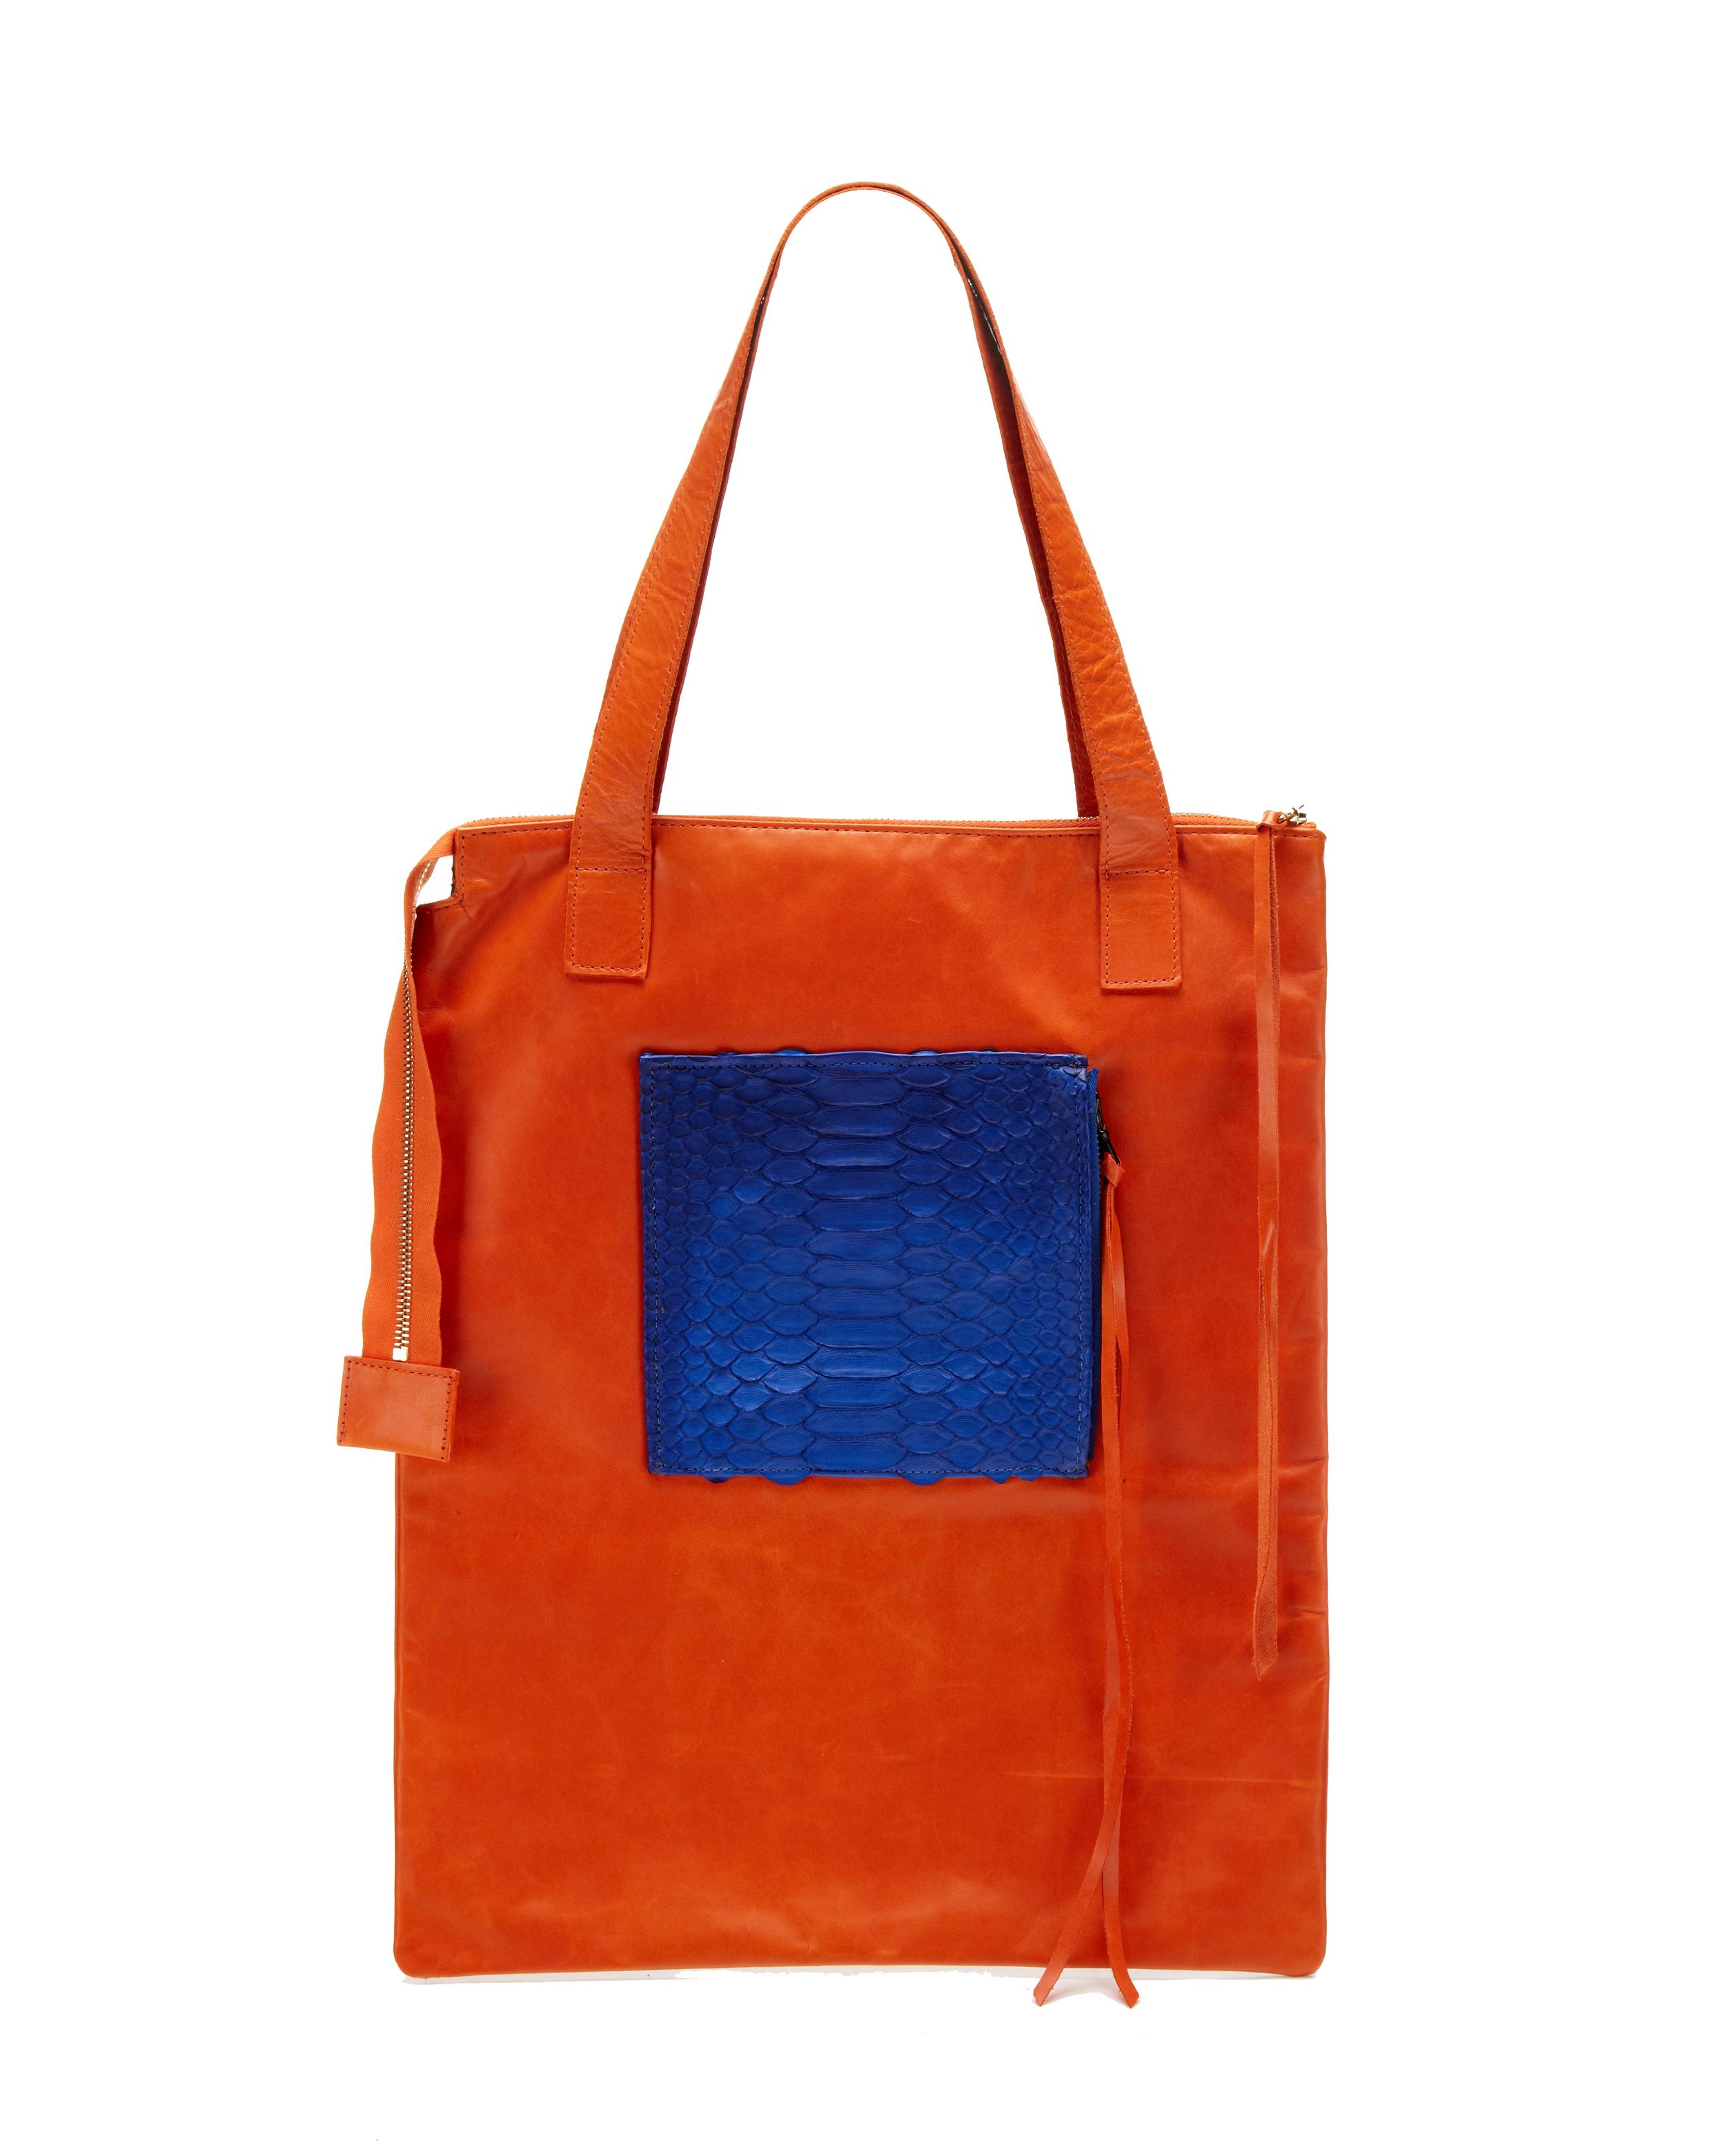 10_tote_orange_blue.jpg